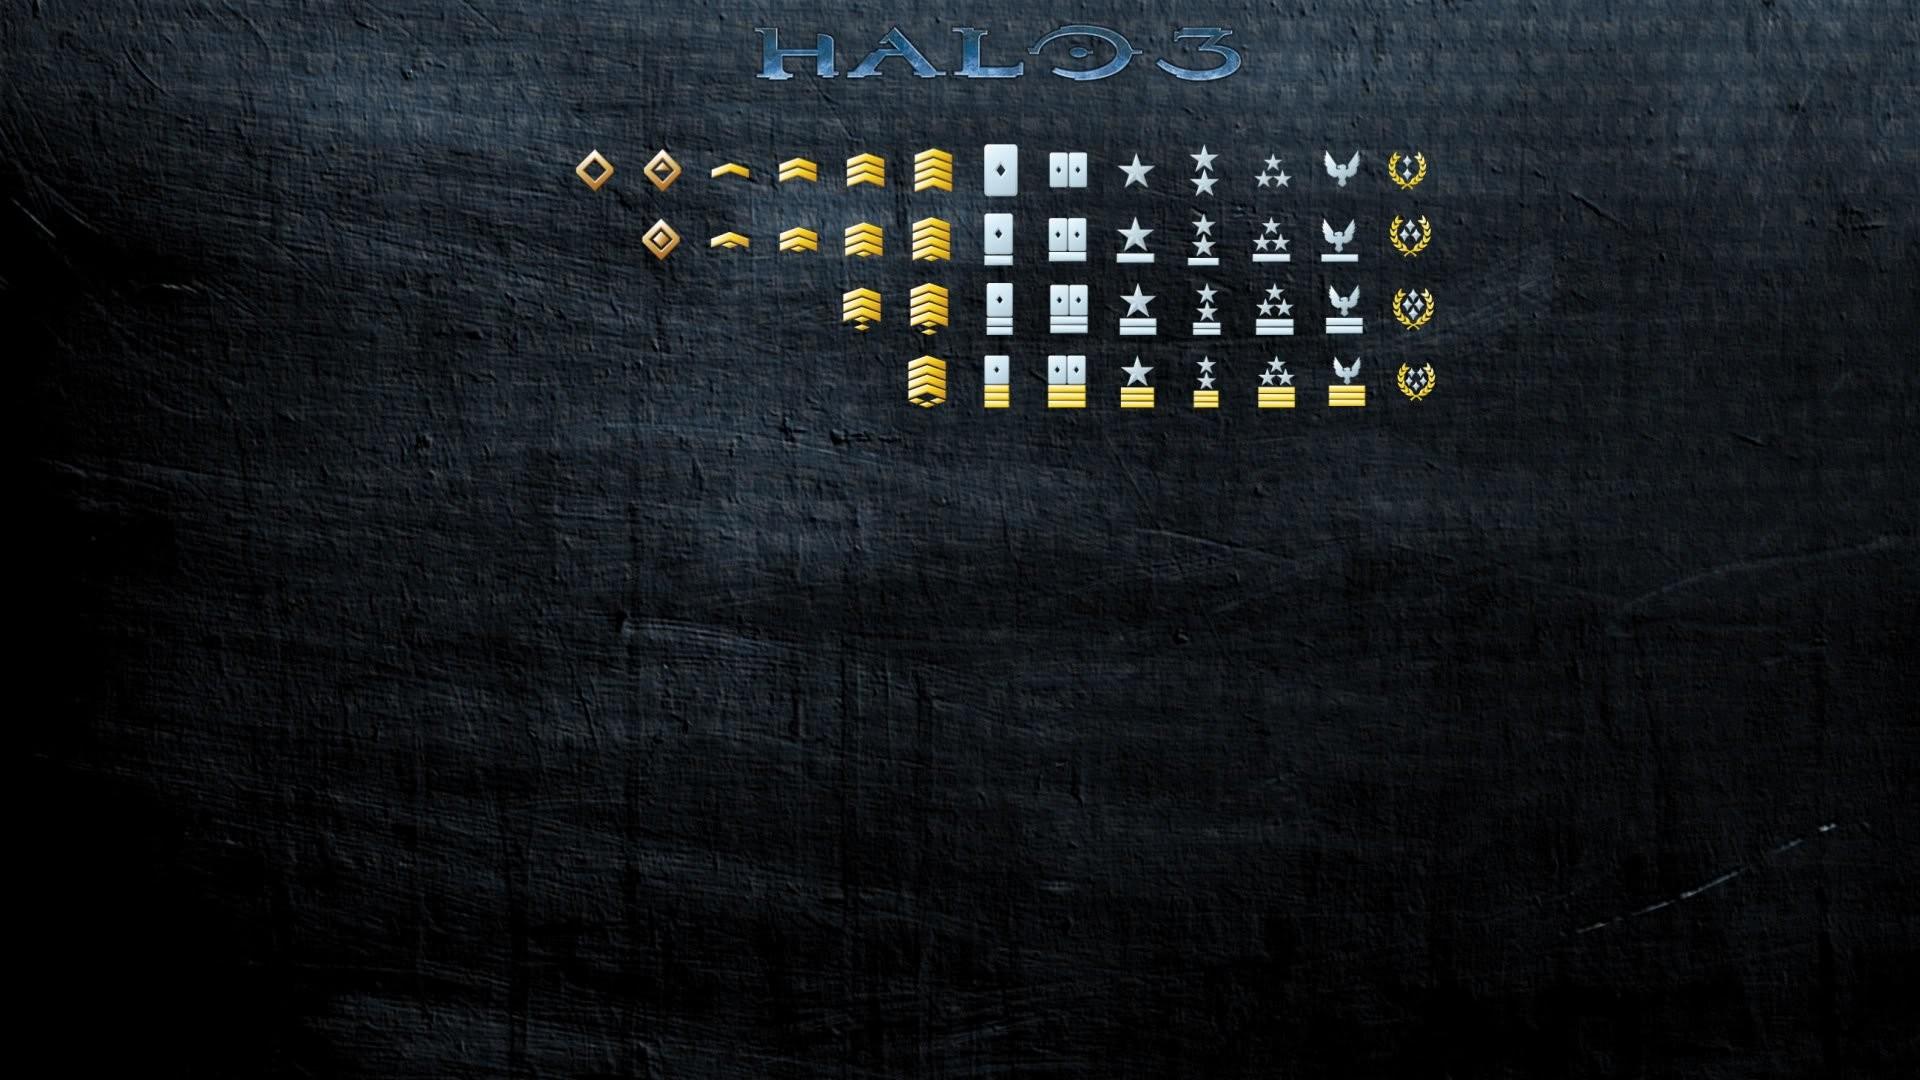 Csgo; halo 3 ranks Halo 3 Ranks; 143547